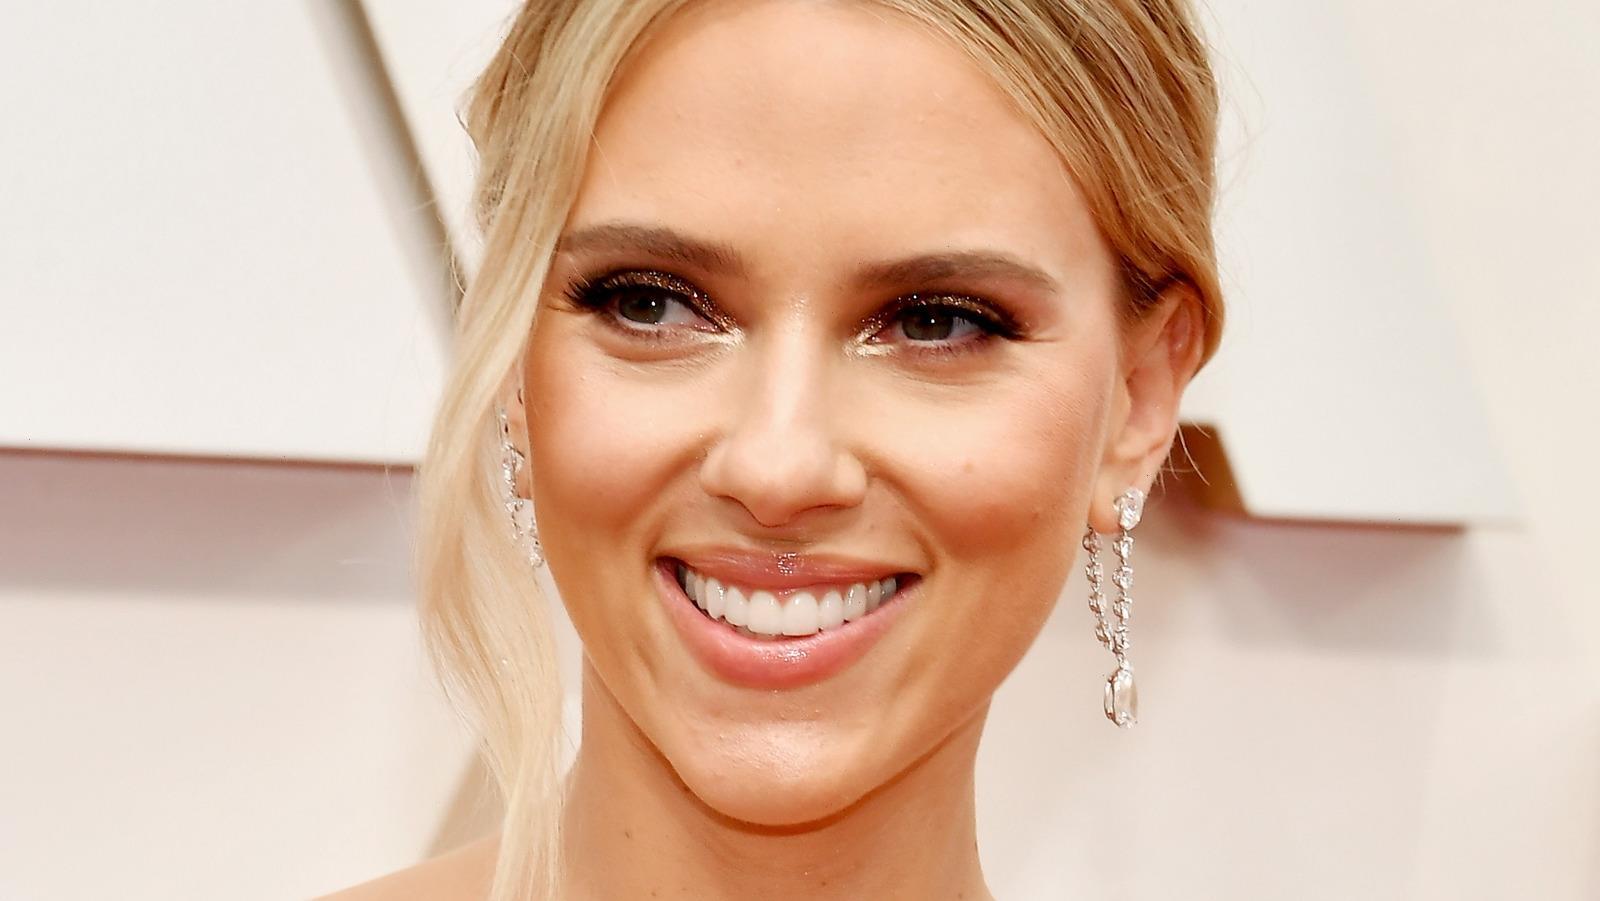 Times Scarlett Johansson Shut Down A Sexist Comment